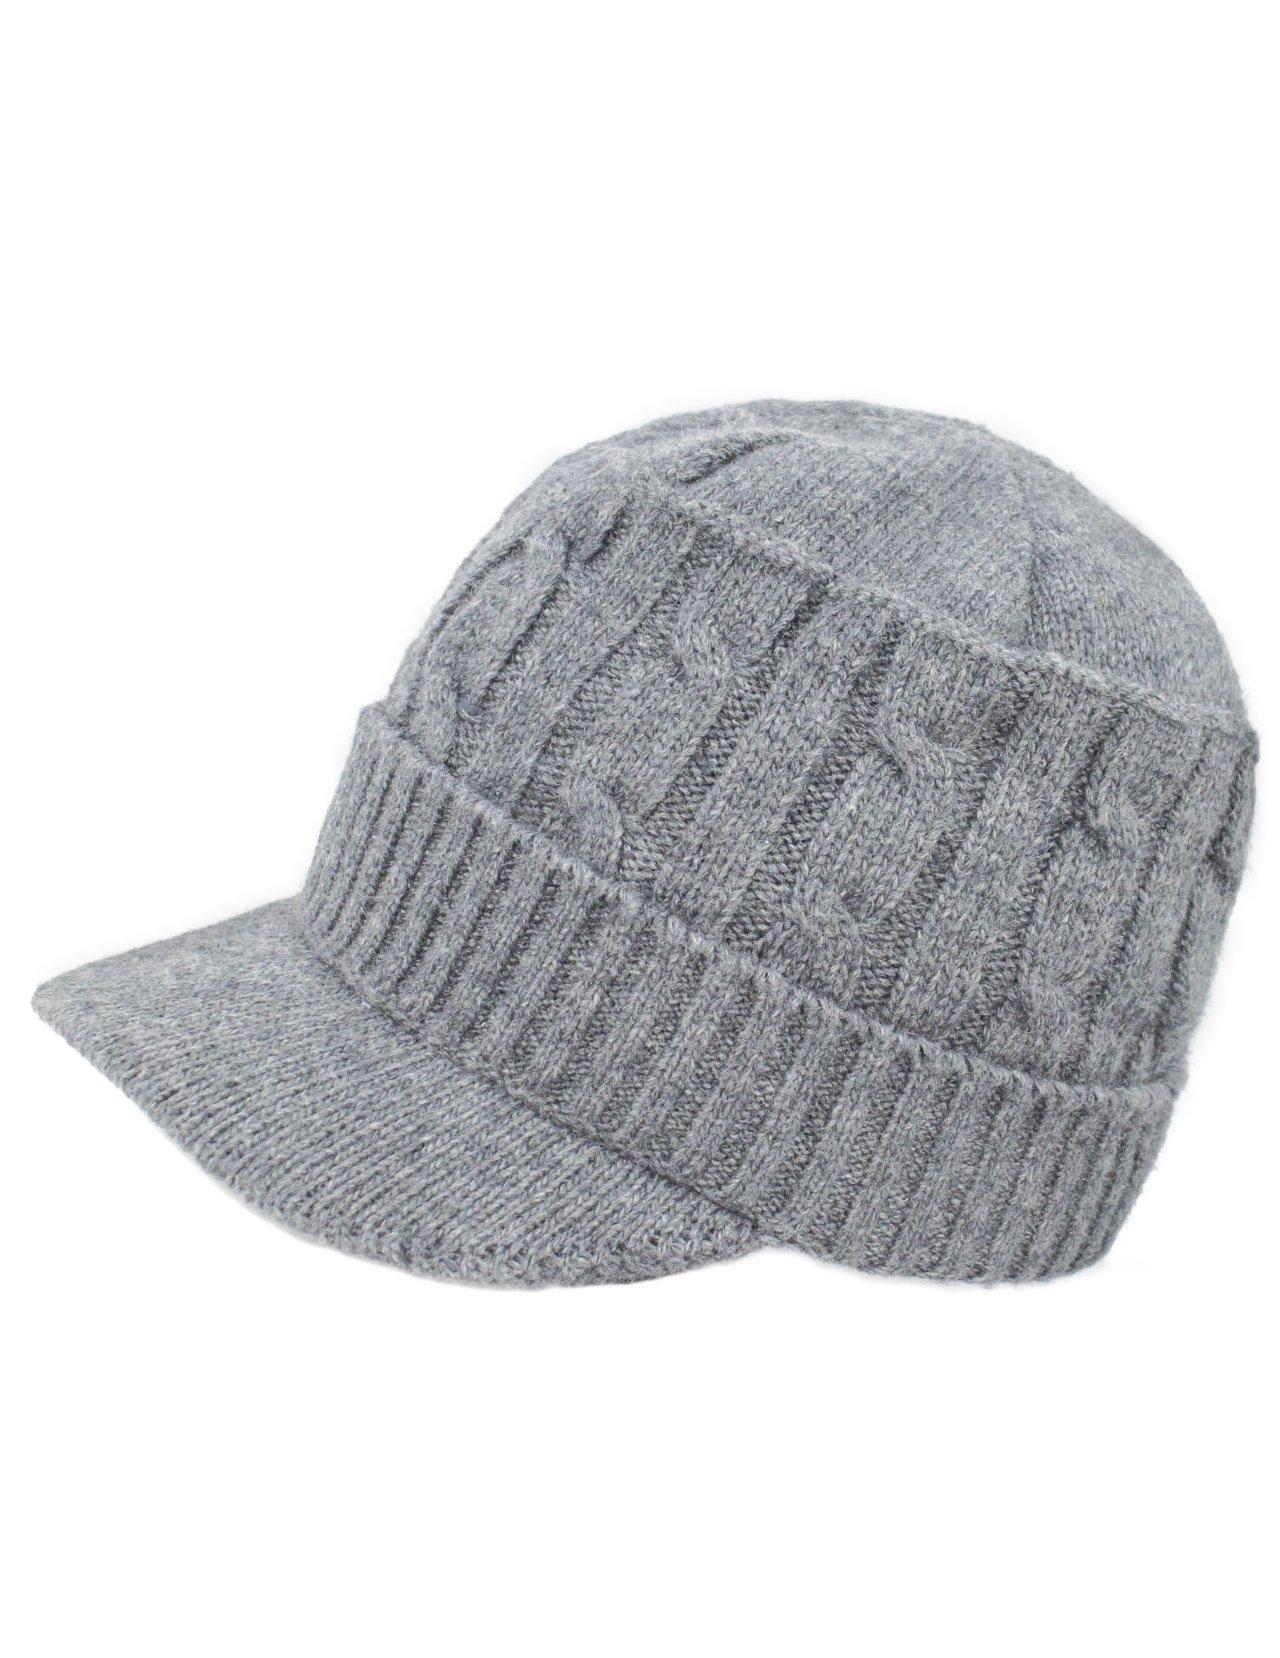 Dahlia Women's Soft & Warm Velour Lined Cable Knit Visor Cap Hat - Light Gray